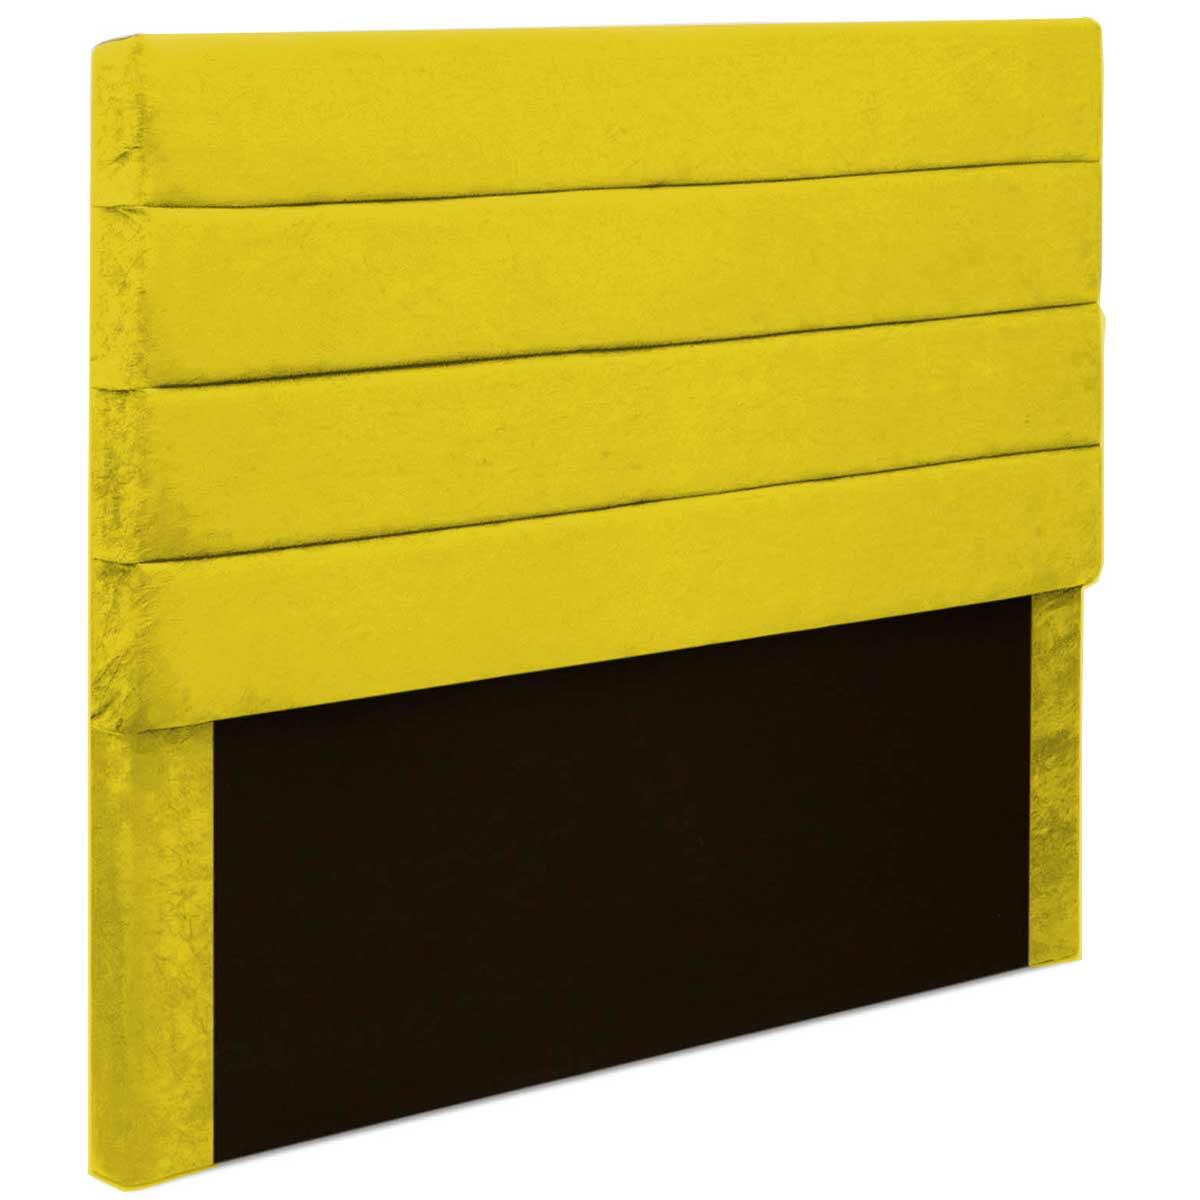 Cabeceira King Estofada Argentina 195 cm Animale Amarelo